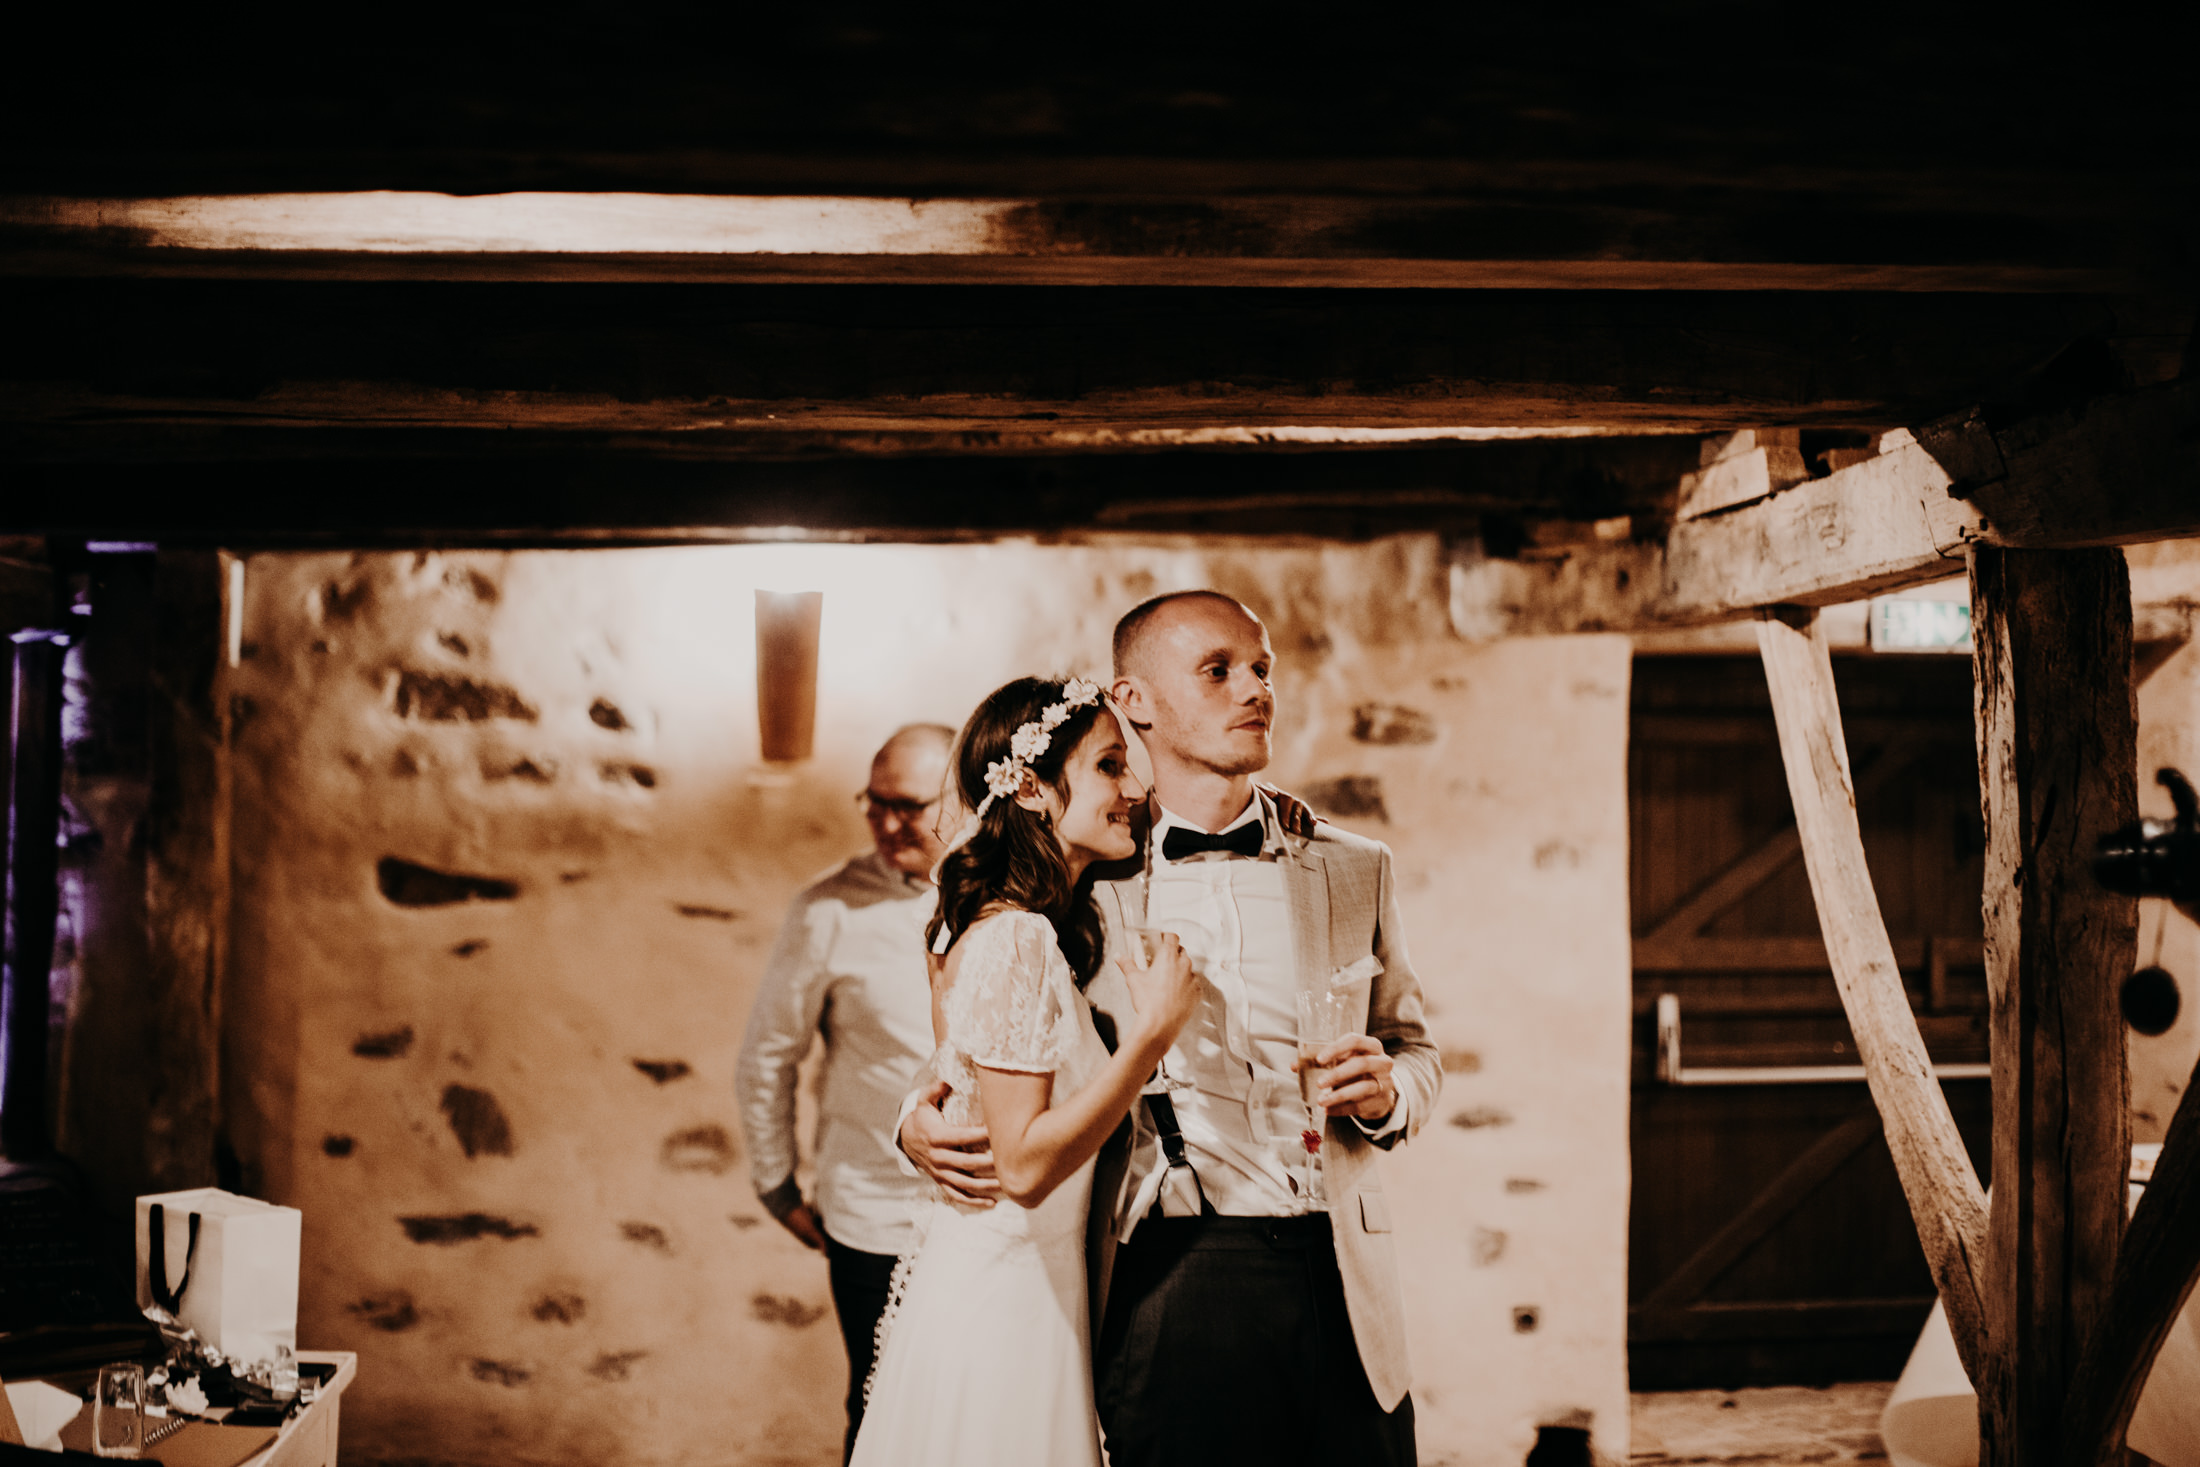 Mariage auvergne photographe wedding_-108.jpg